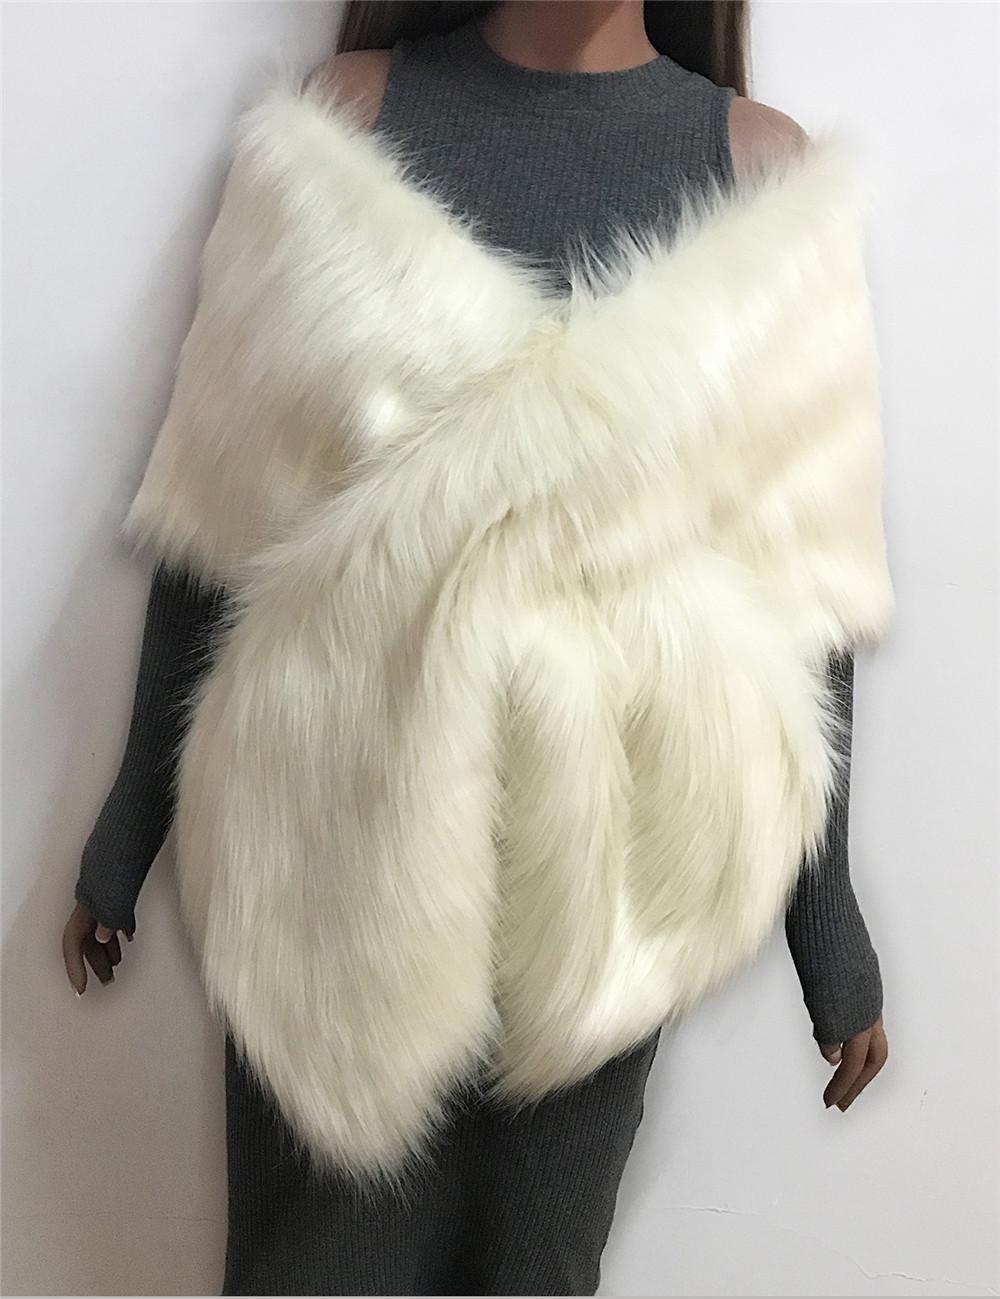 The autumn and winter new imitation fur big cape neck scarf multi-color joker scarf bride dress cross cape (5)